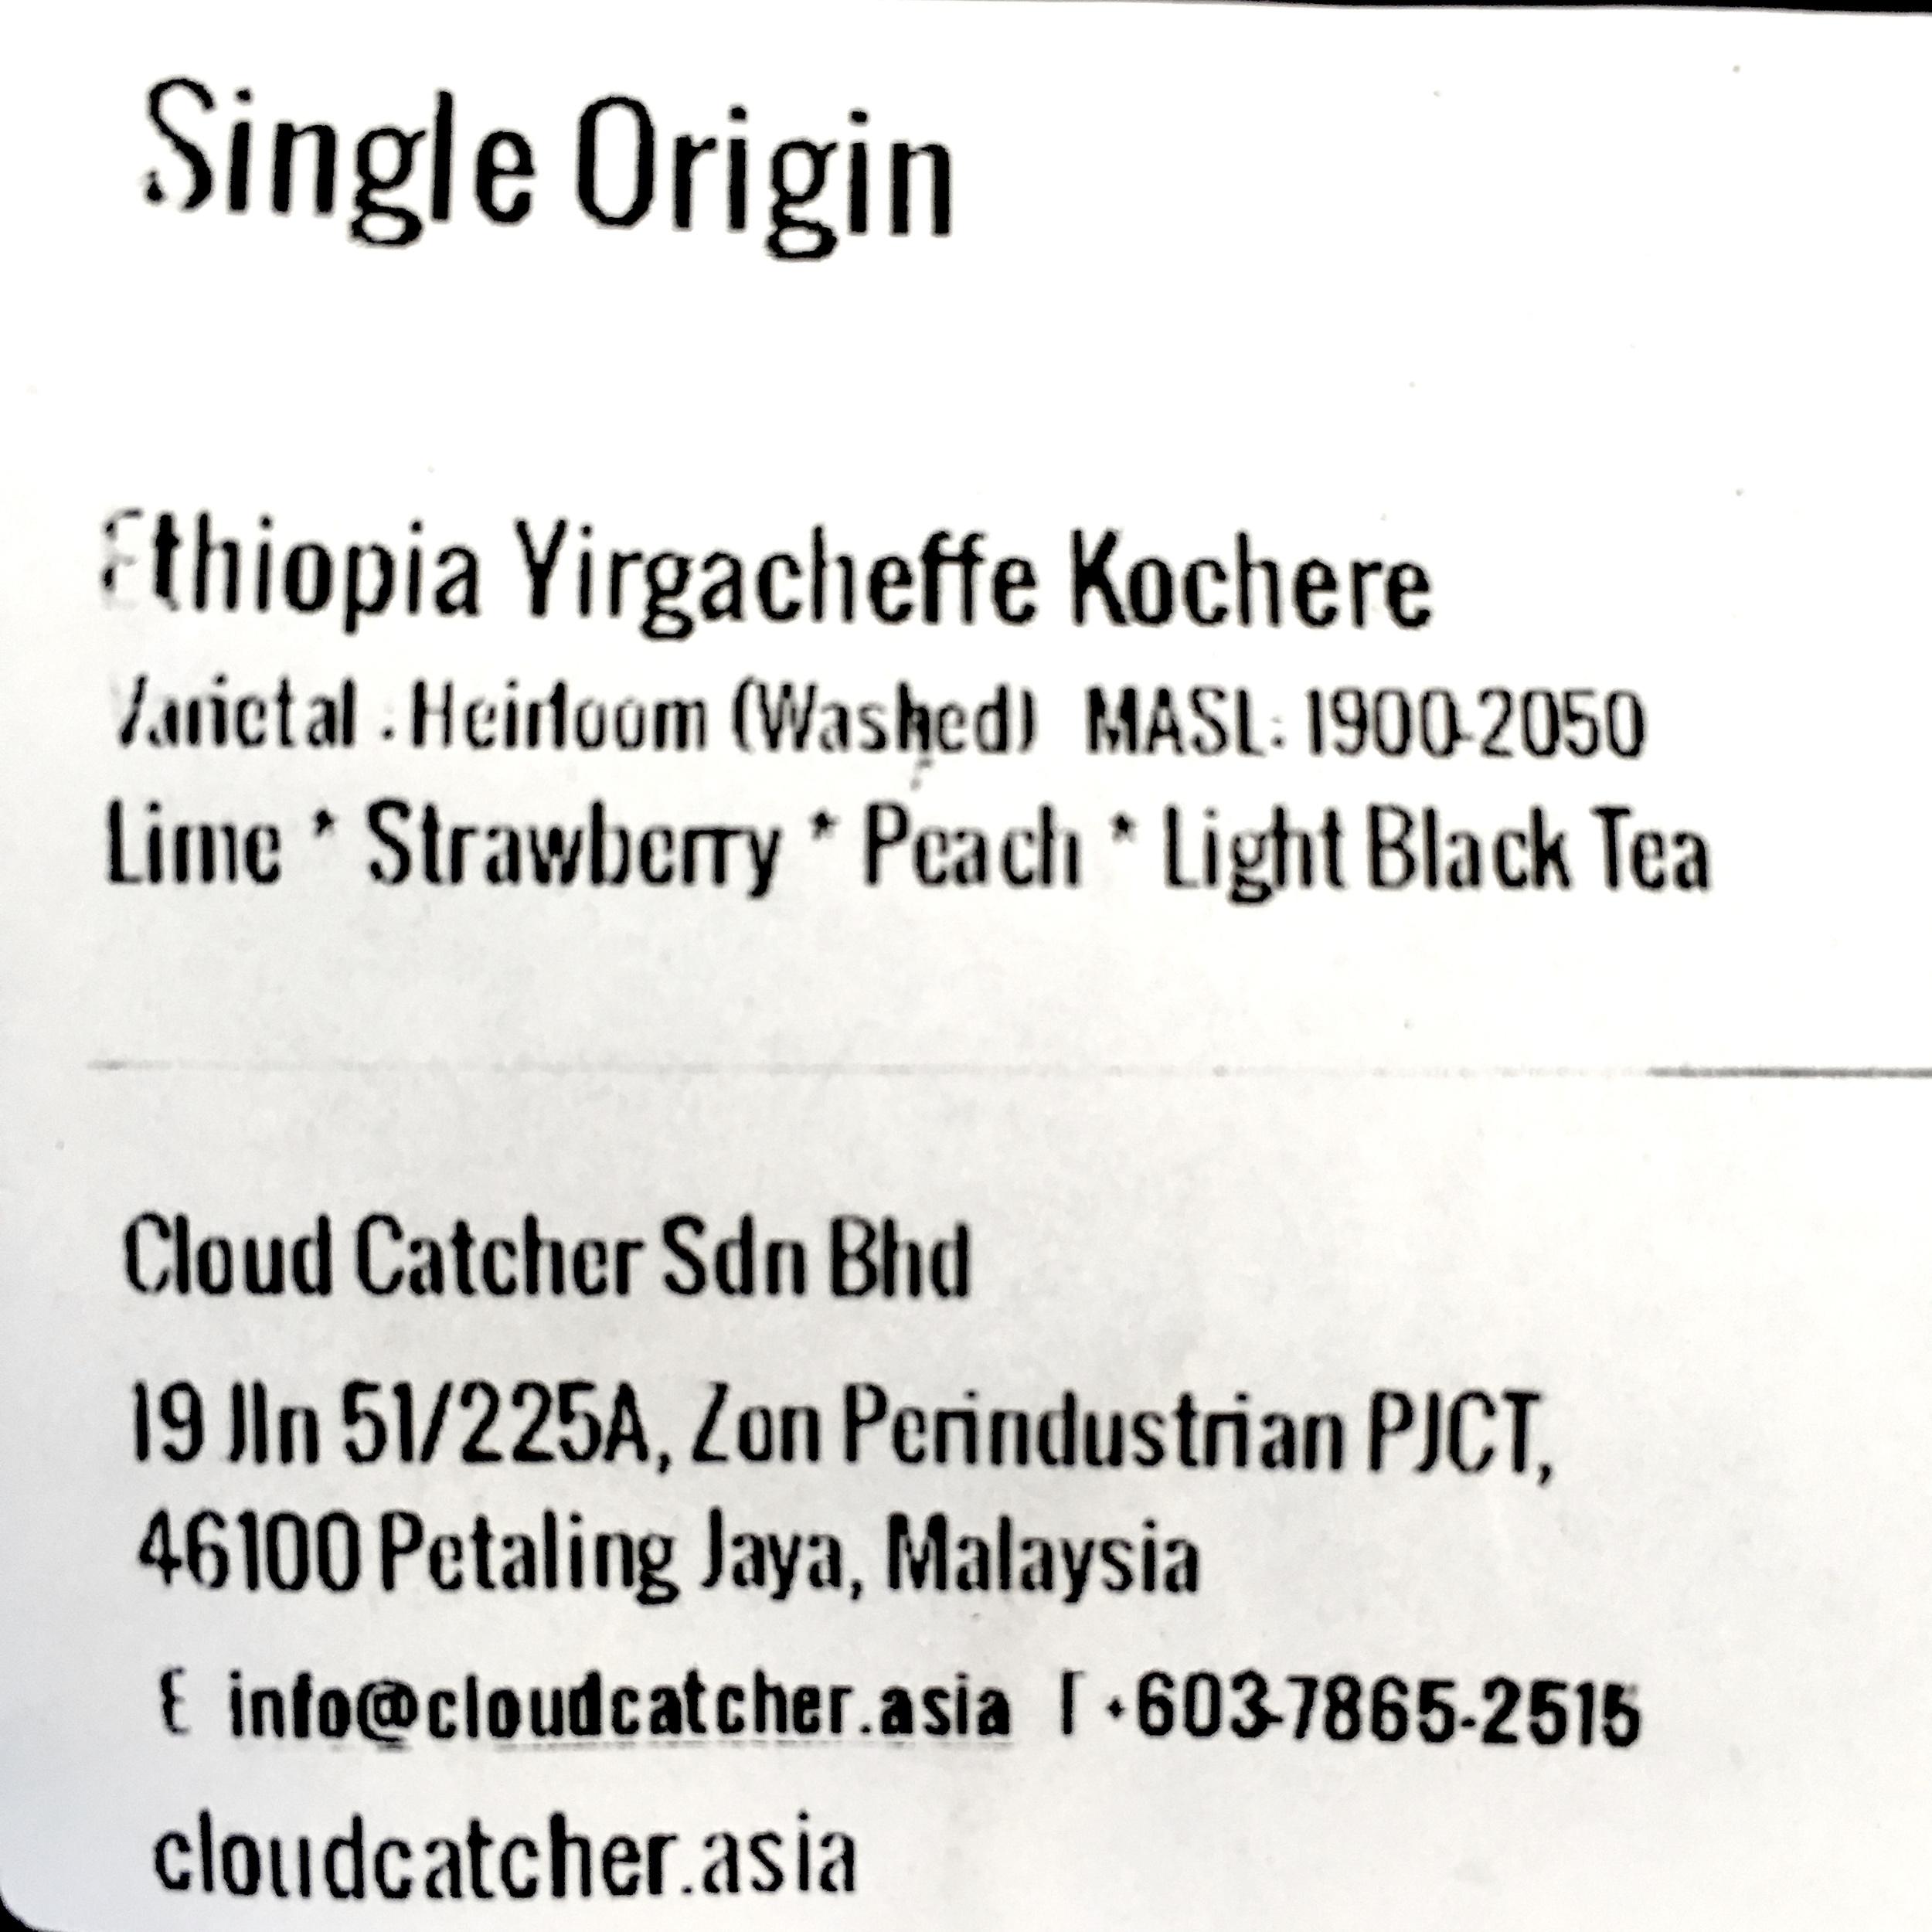 Cloudcatcher Coffee Information and Coffee Origin Details